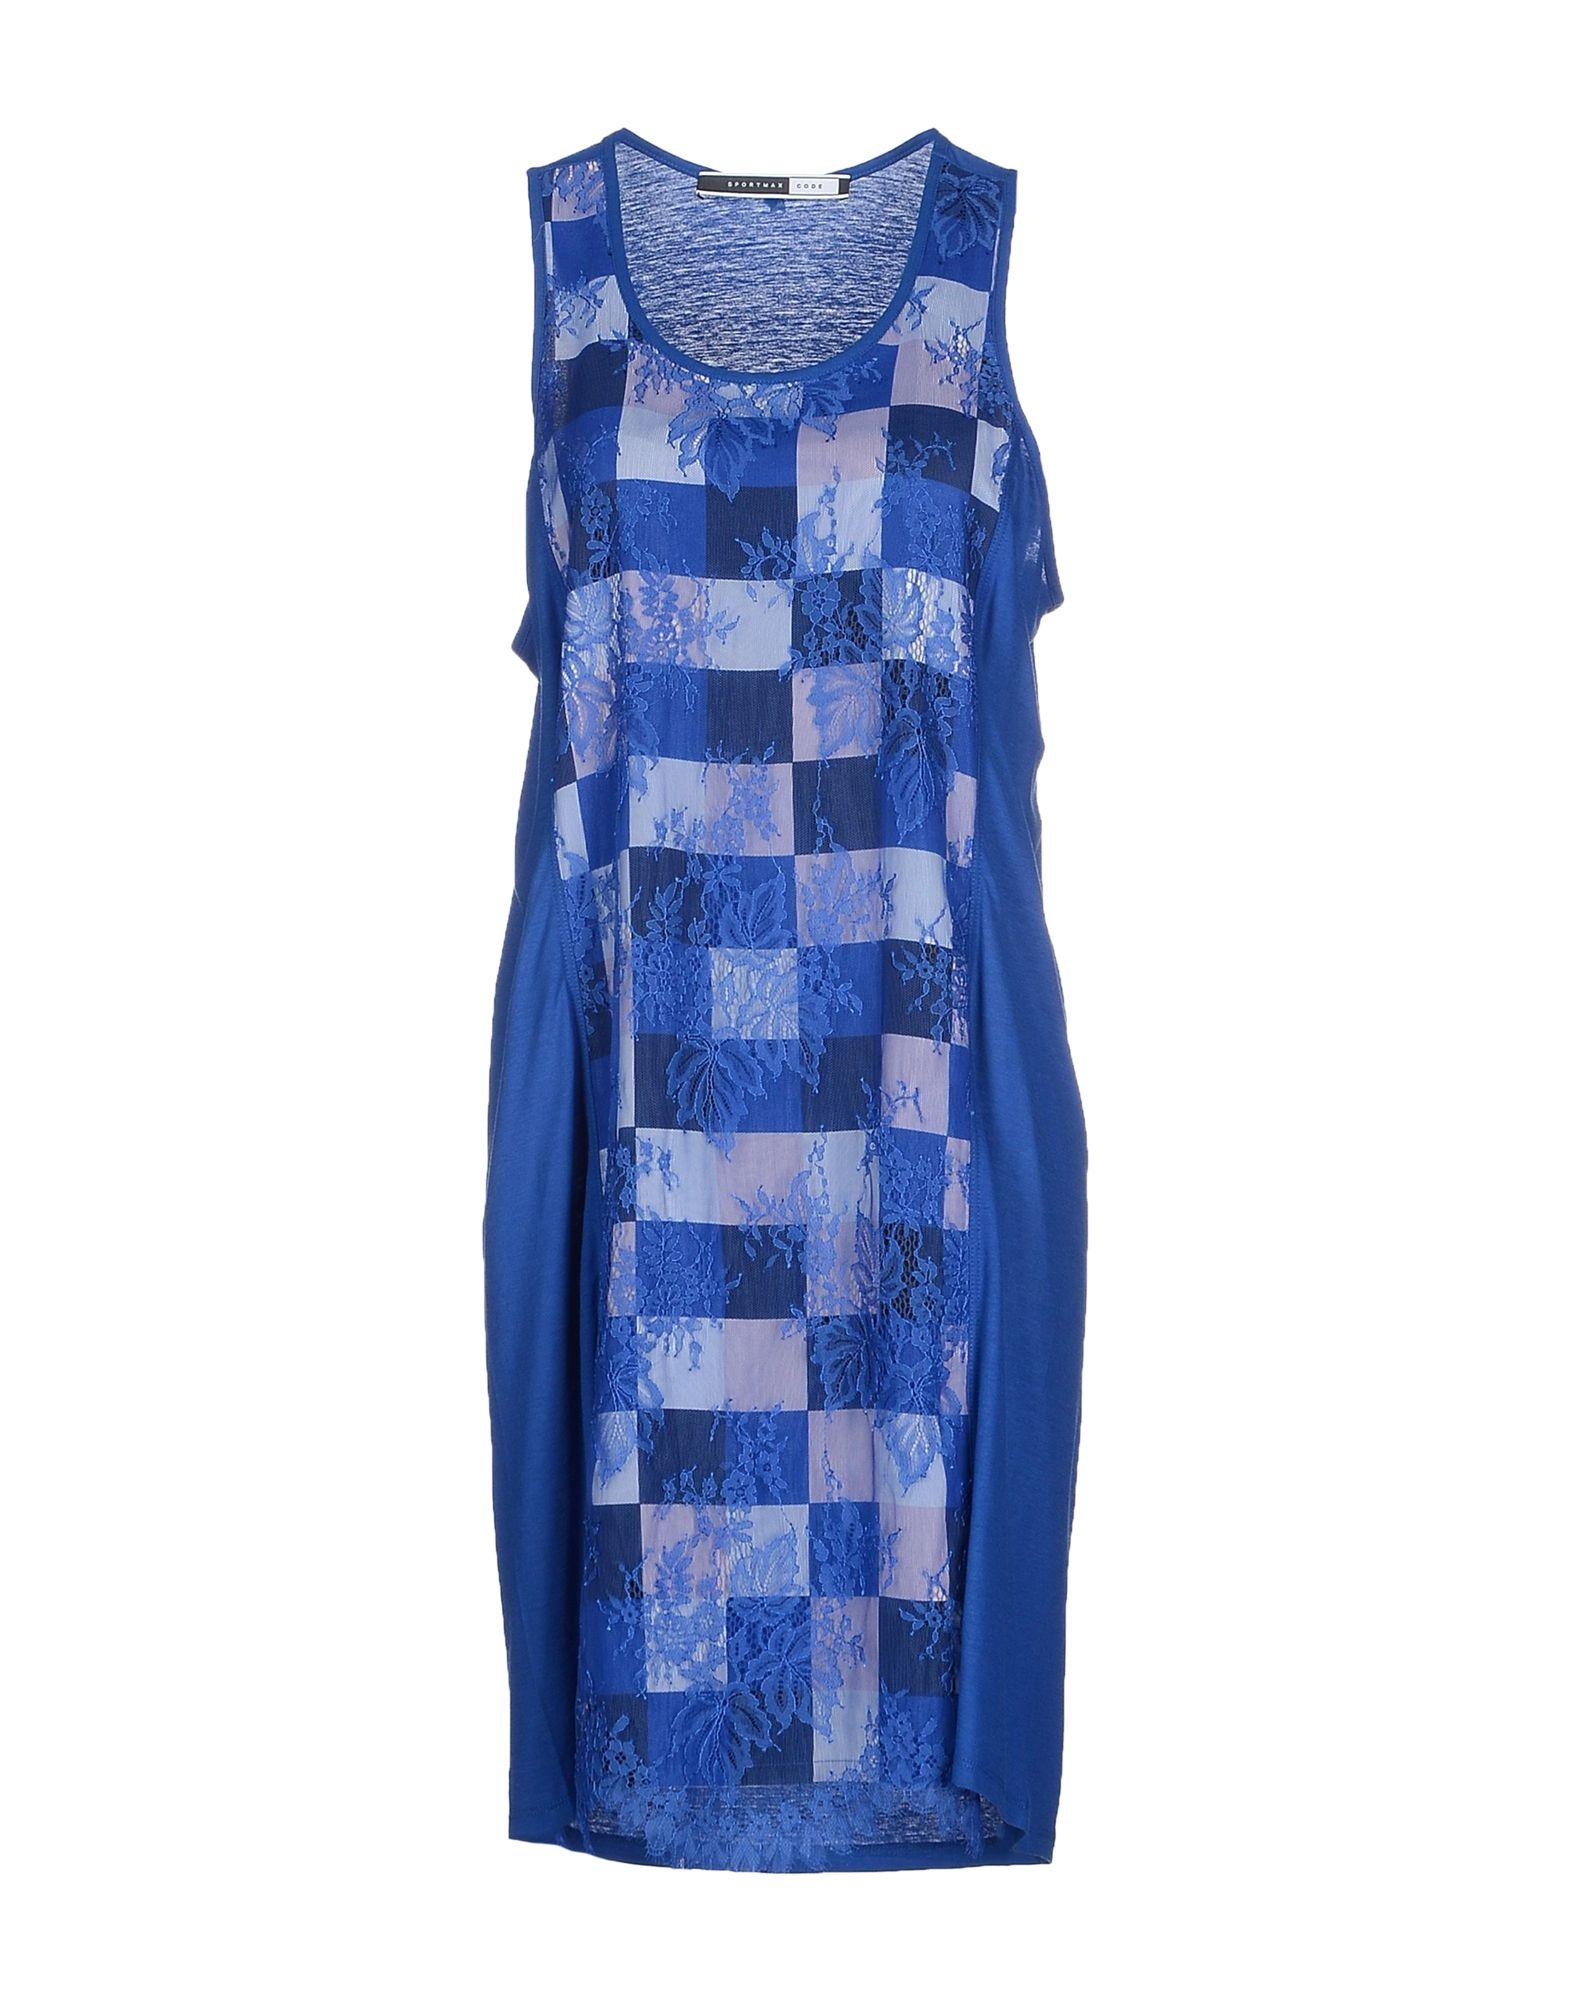 Фото - SPORTMAX CODE Короткое платье рюкзак code code co073bwbyzk6